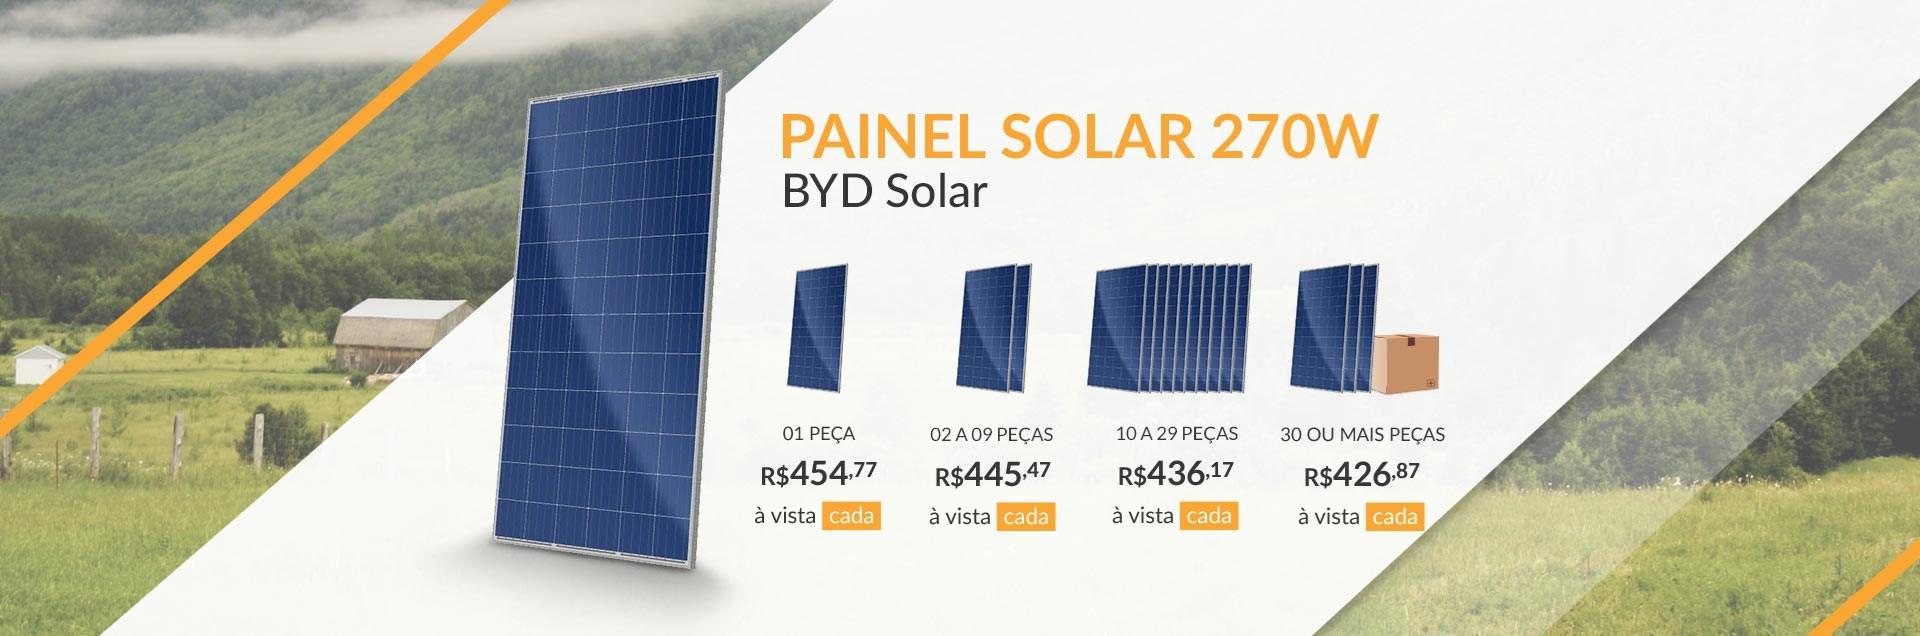 Painel Solar 270W BYD Solar - Junho